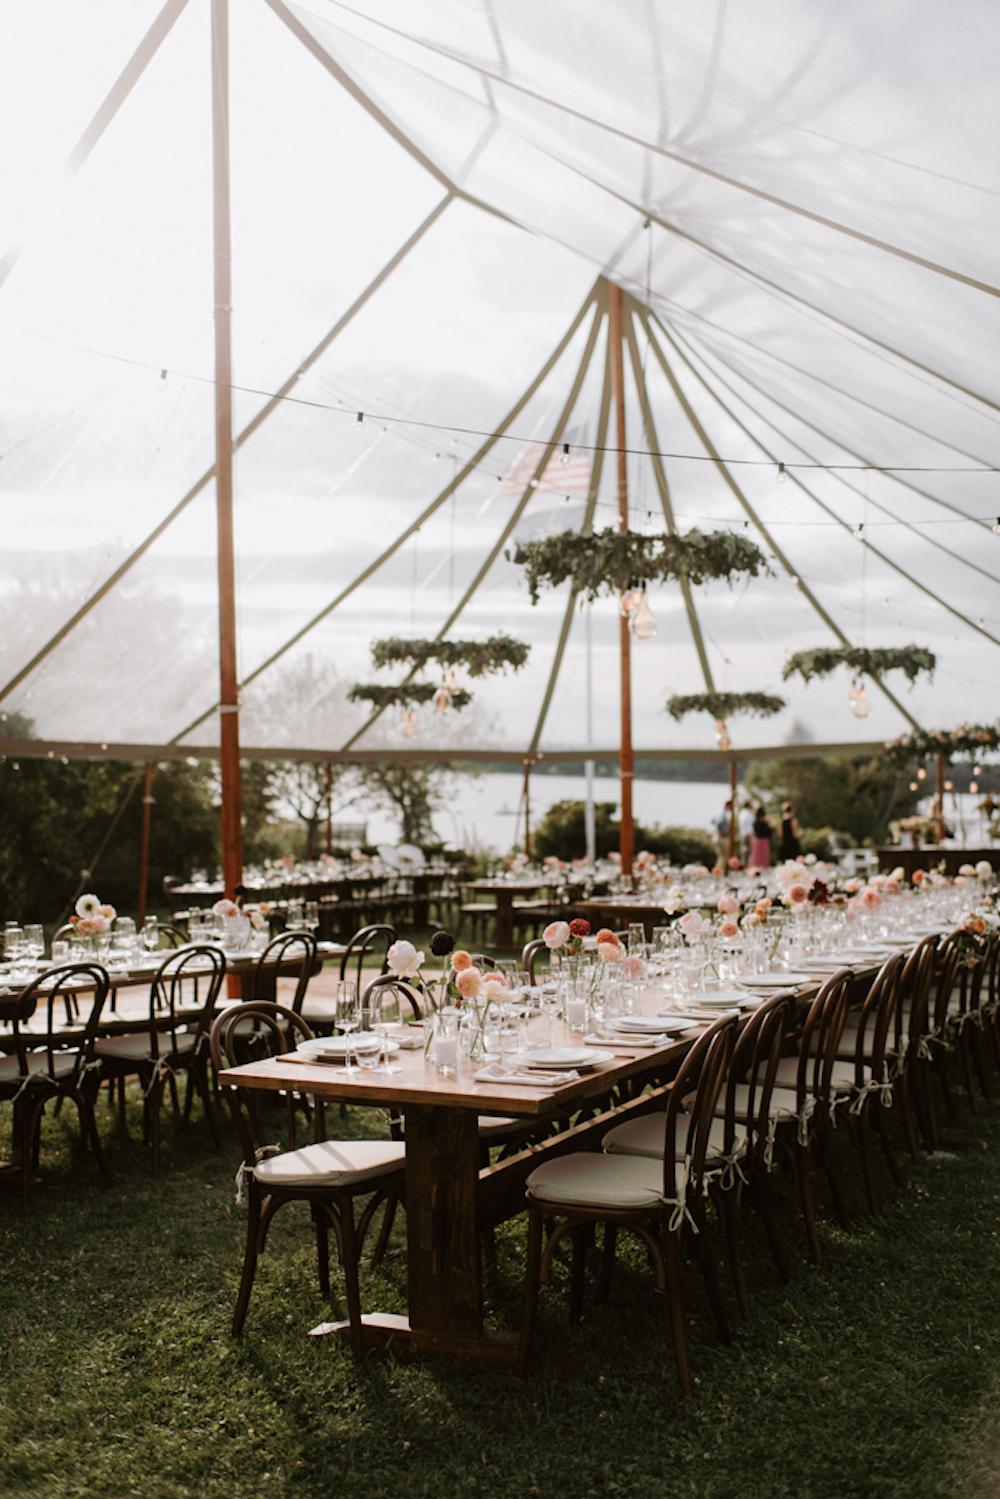 Tented wedding reception at Chebeague Island Inn